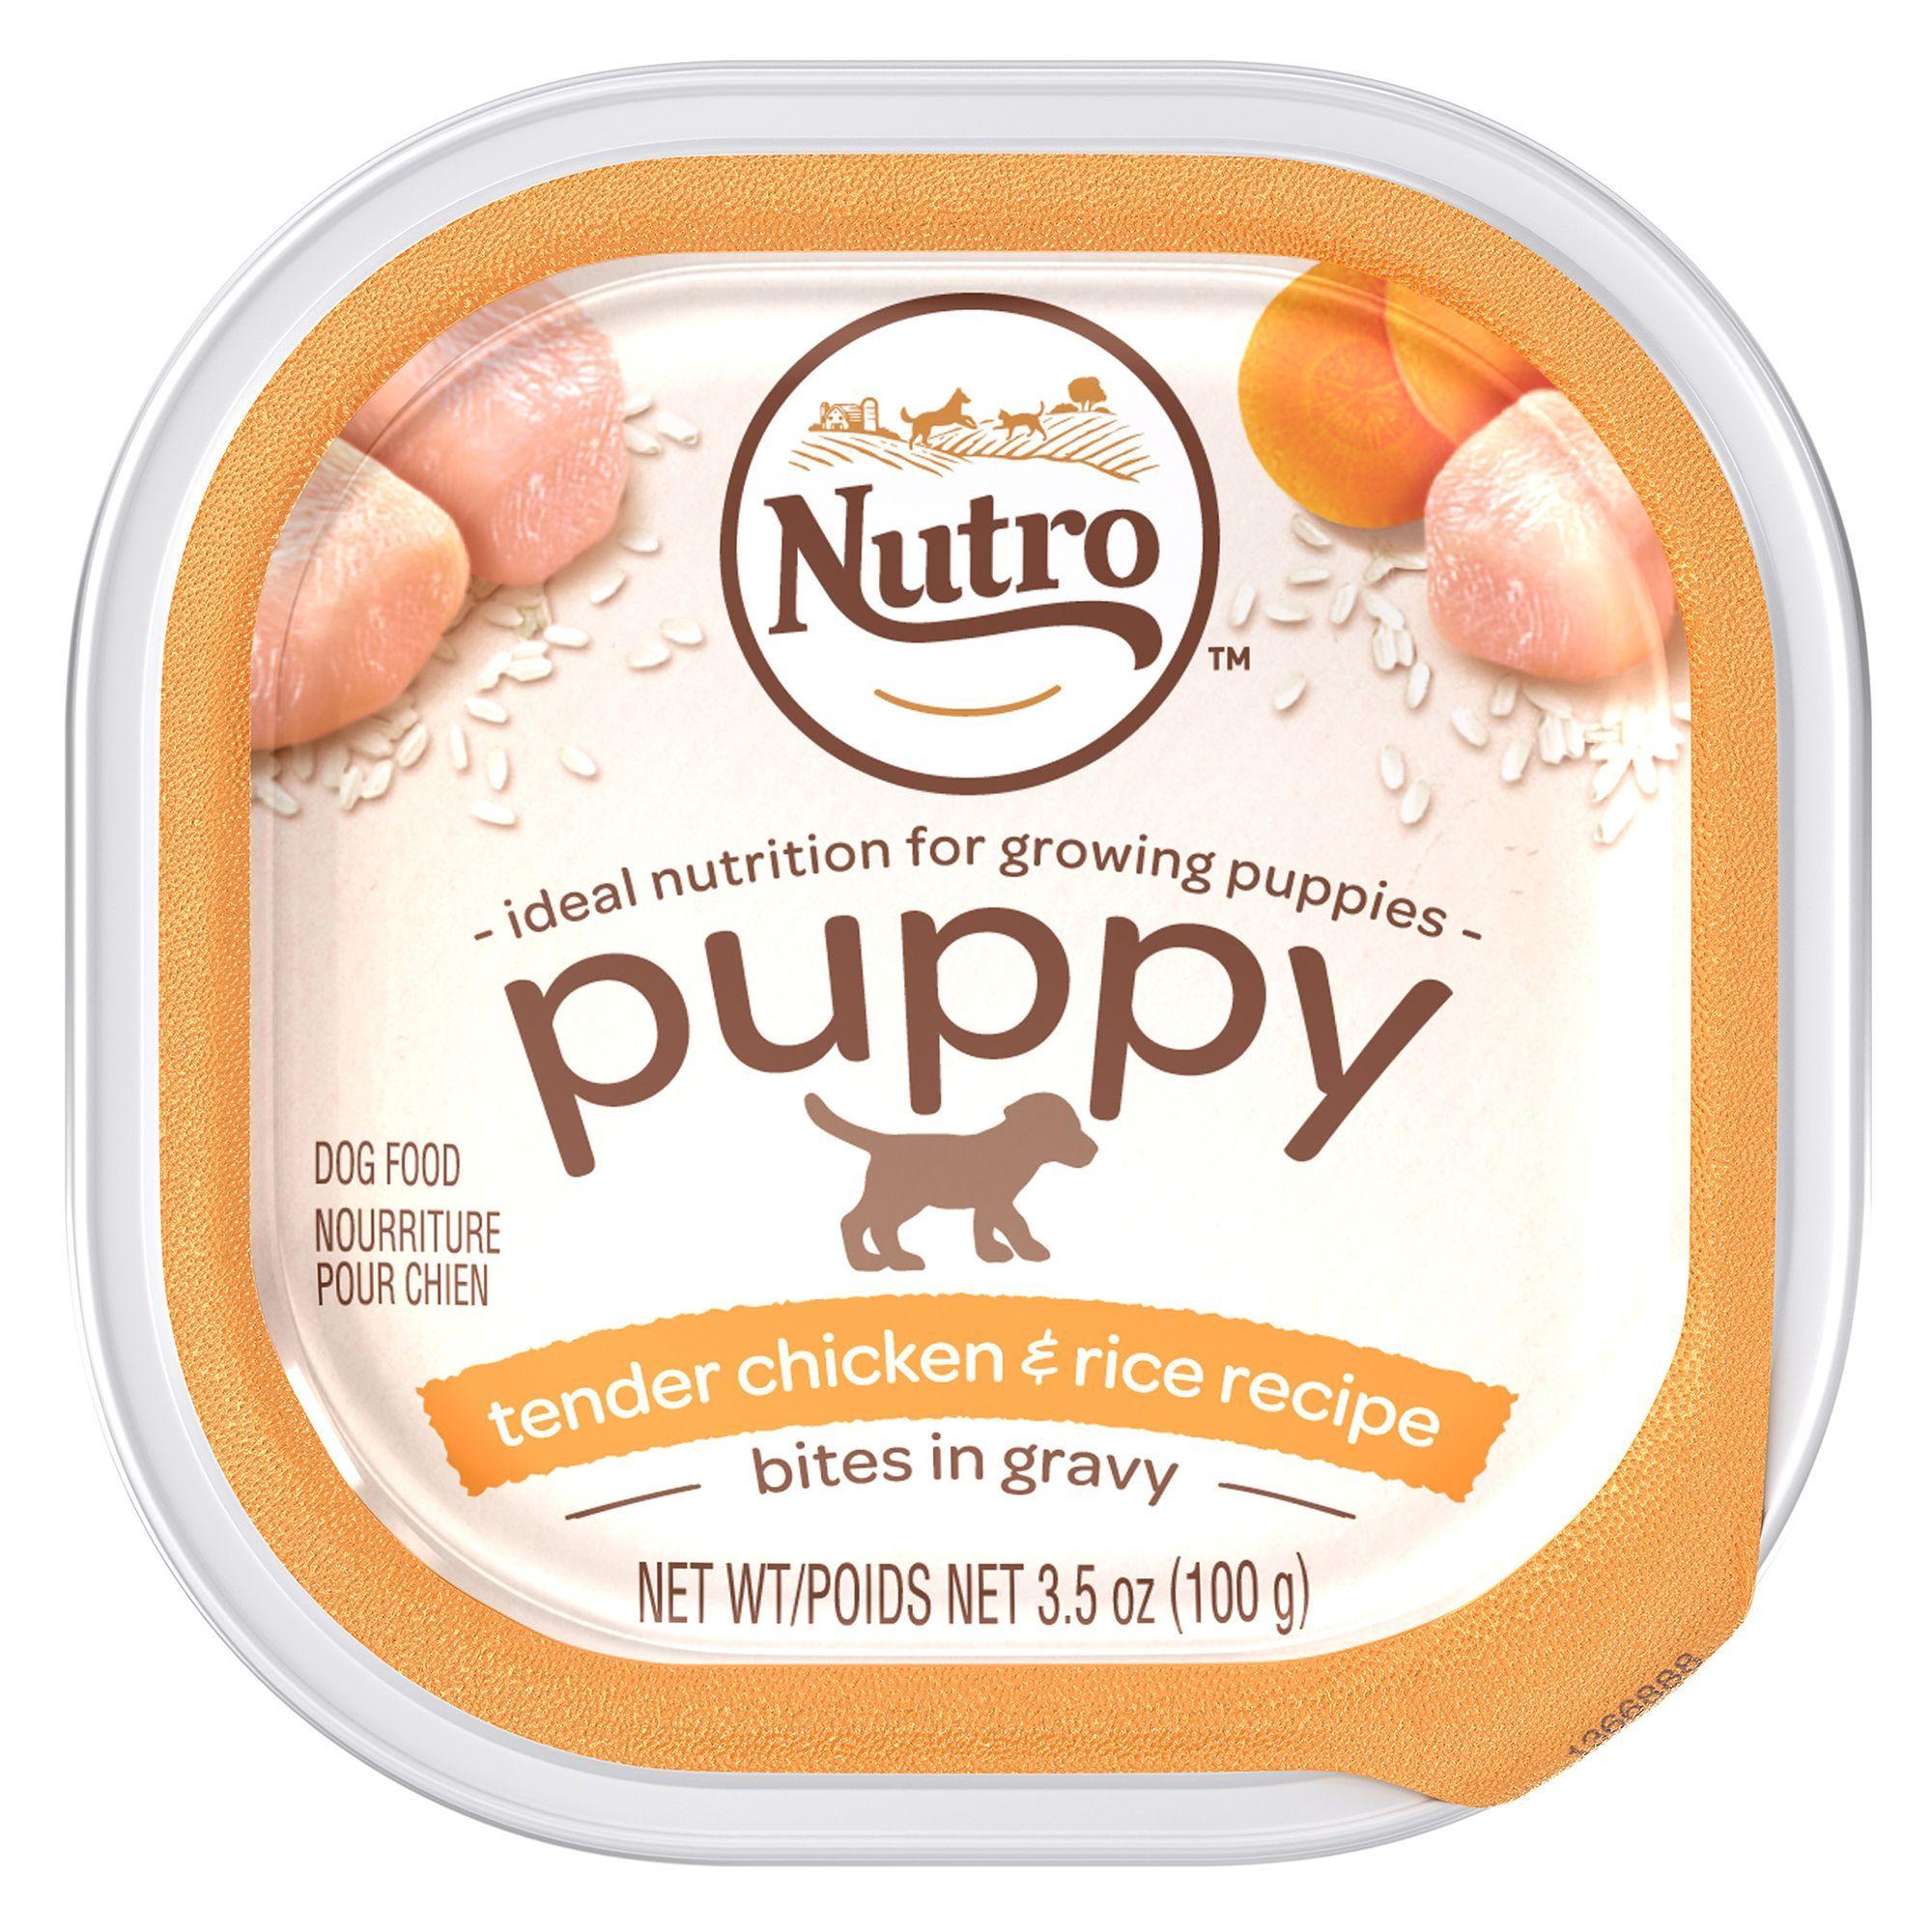 Nutro Puppy Food - Natural, Tender Chicken & Rice